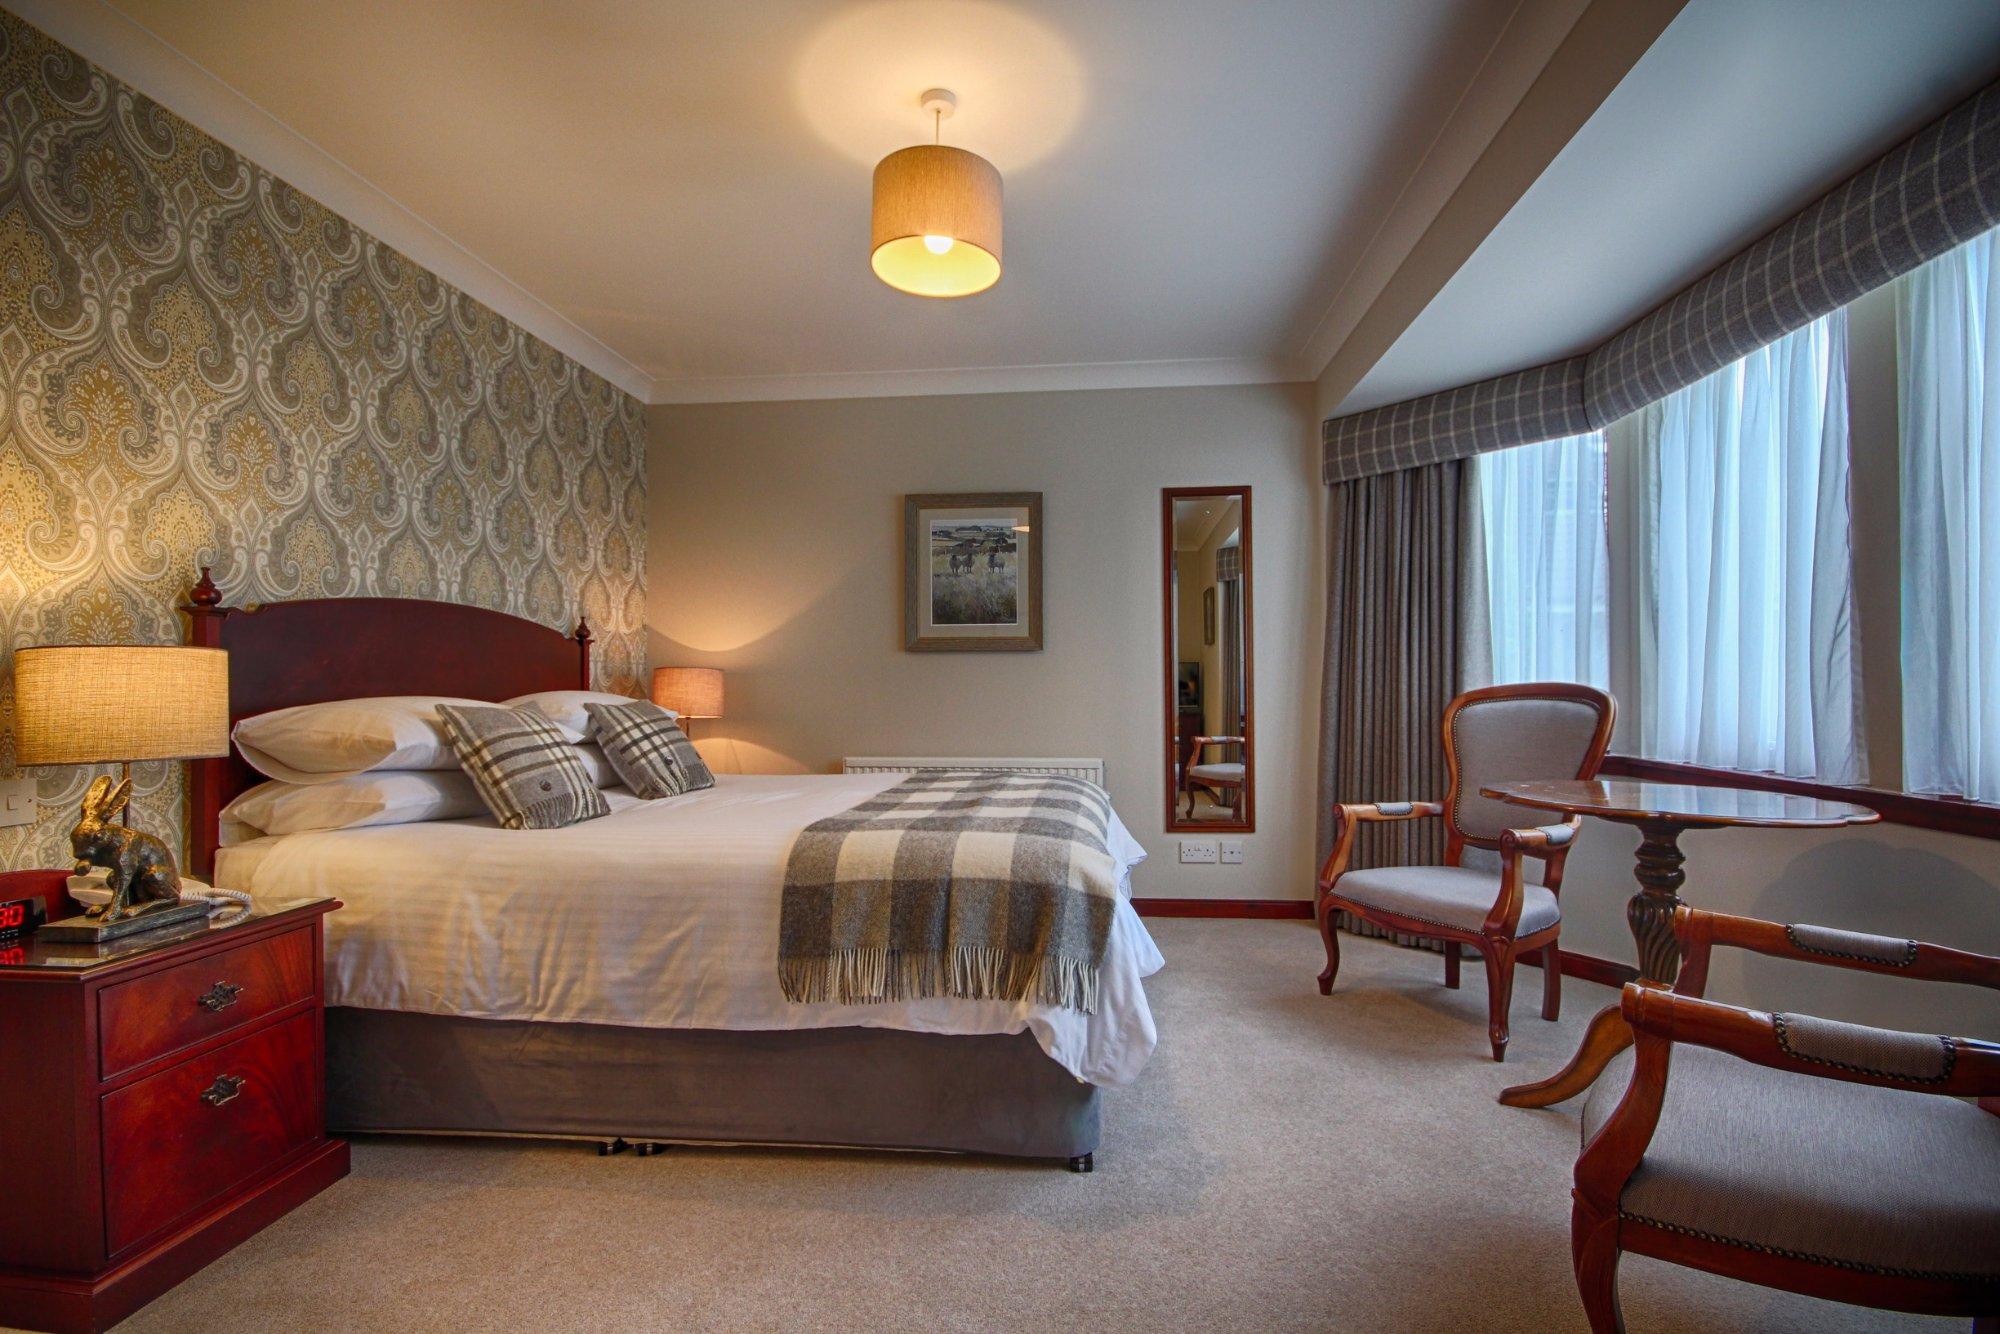 strathburn hotel (inverurie) - reviews, photos & price comparison